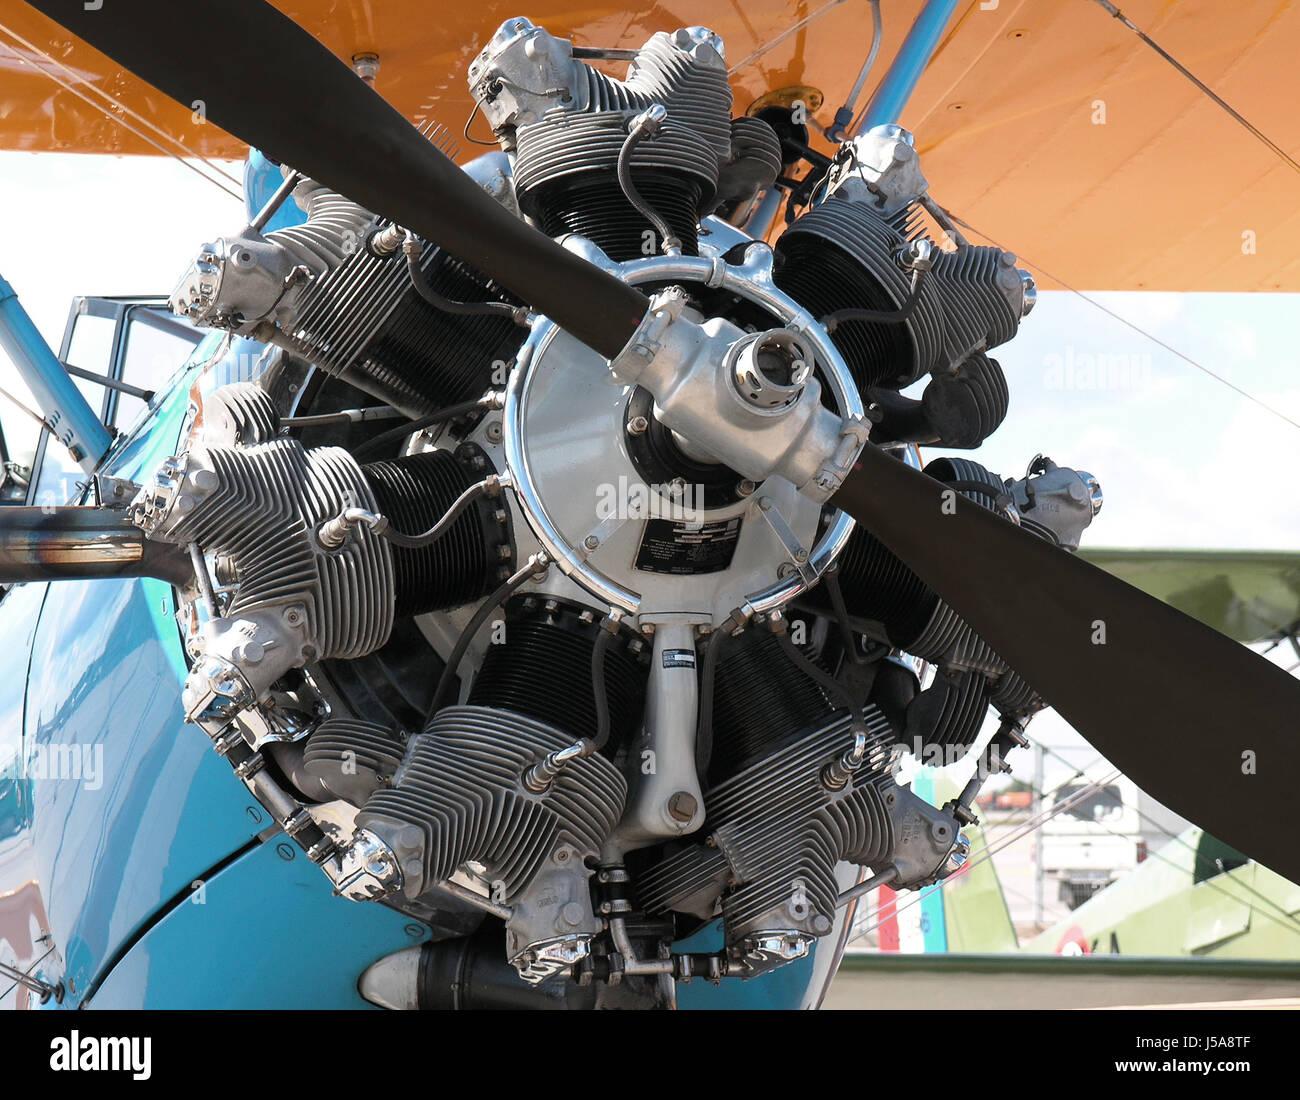 Combustion Motor Stockfotos & Combustion Motor Bilder - Alamy